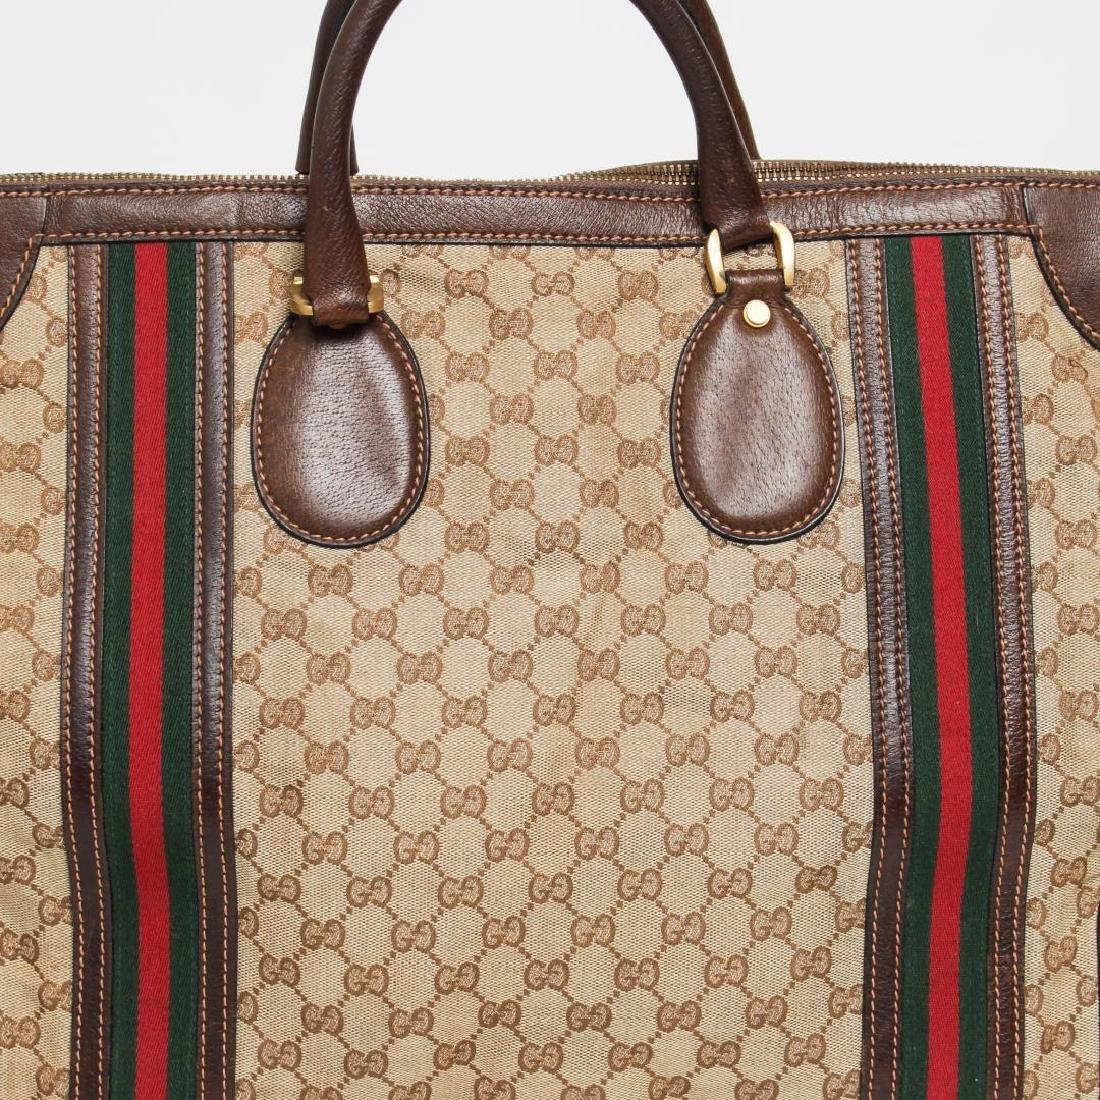 Vintage Gucci Travel Duffel Bag, Monogram Canvas - 6